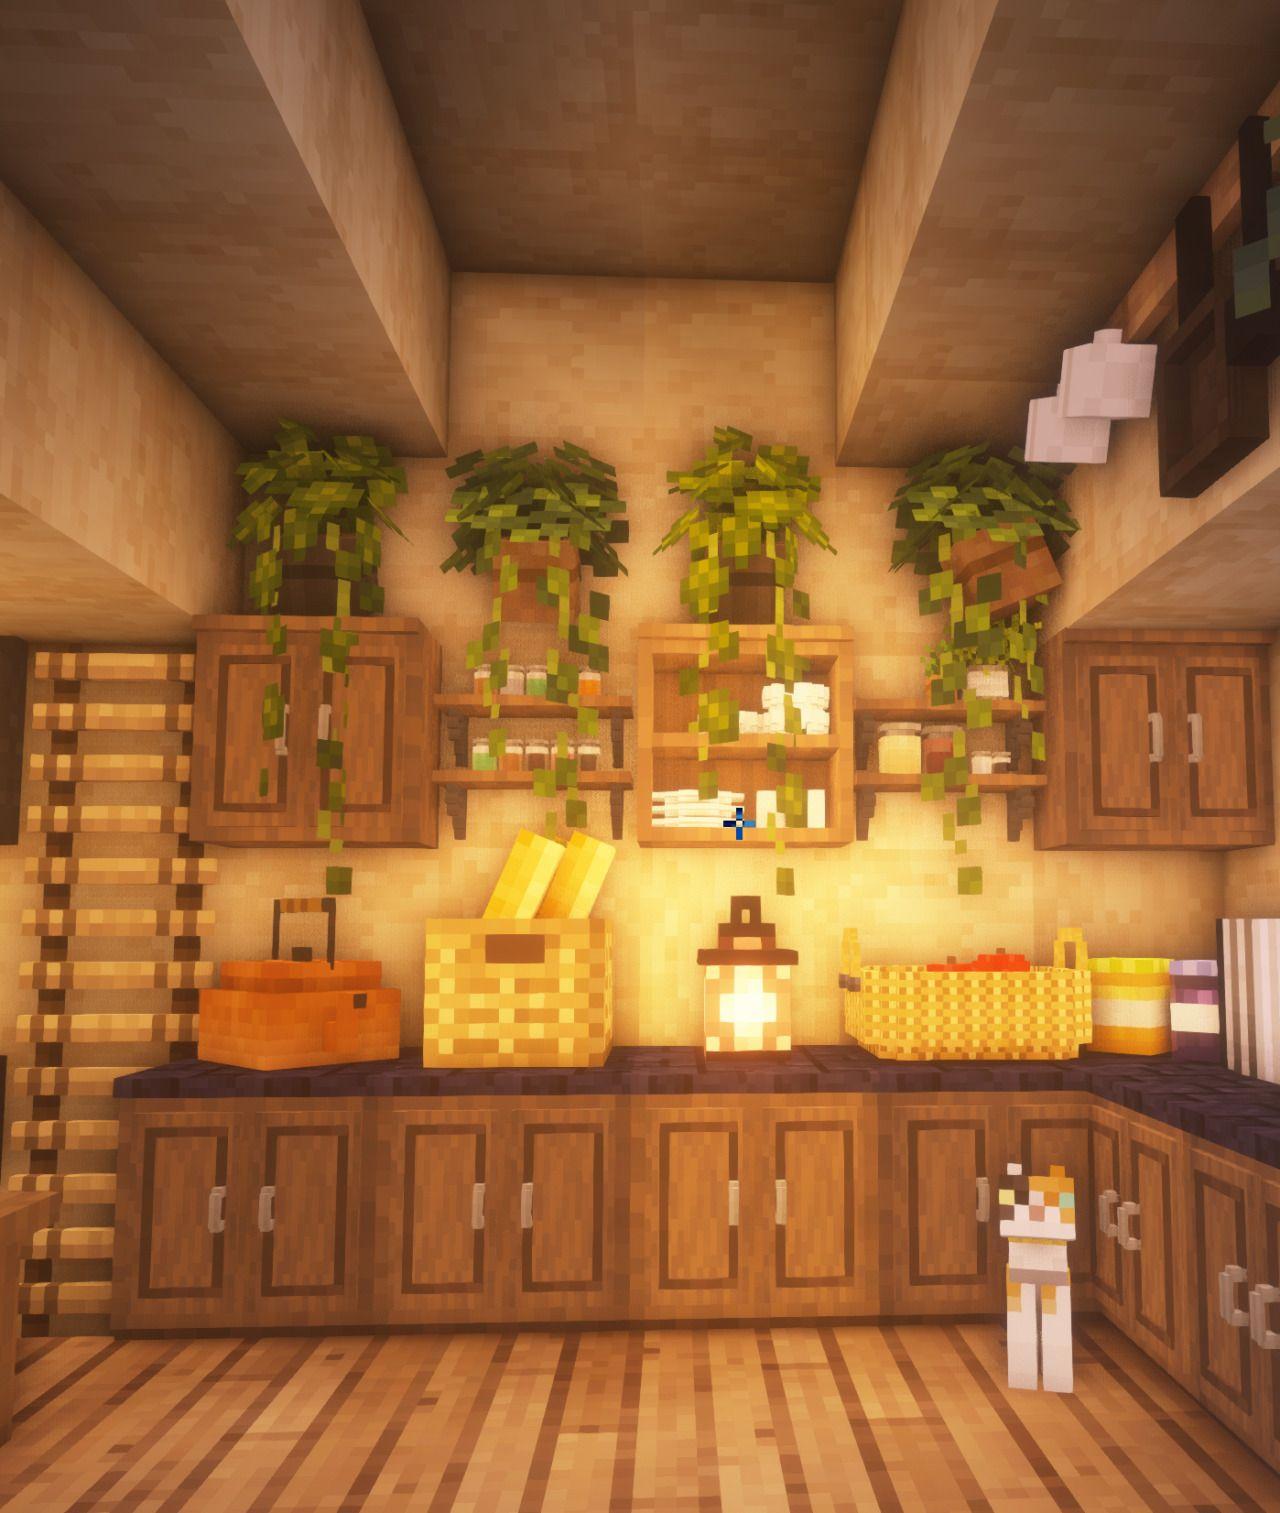 Bees Witch Cottage Details Minecraft Wallpaper Minecraft Cottage Minecraft Blueprints